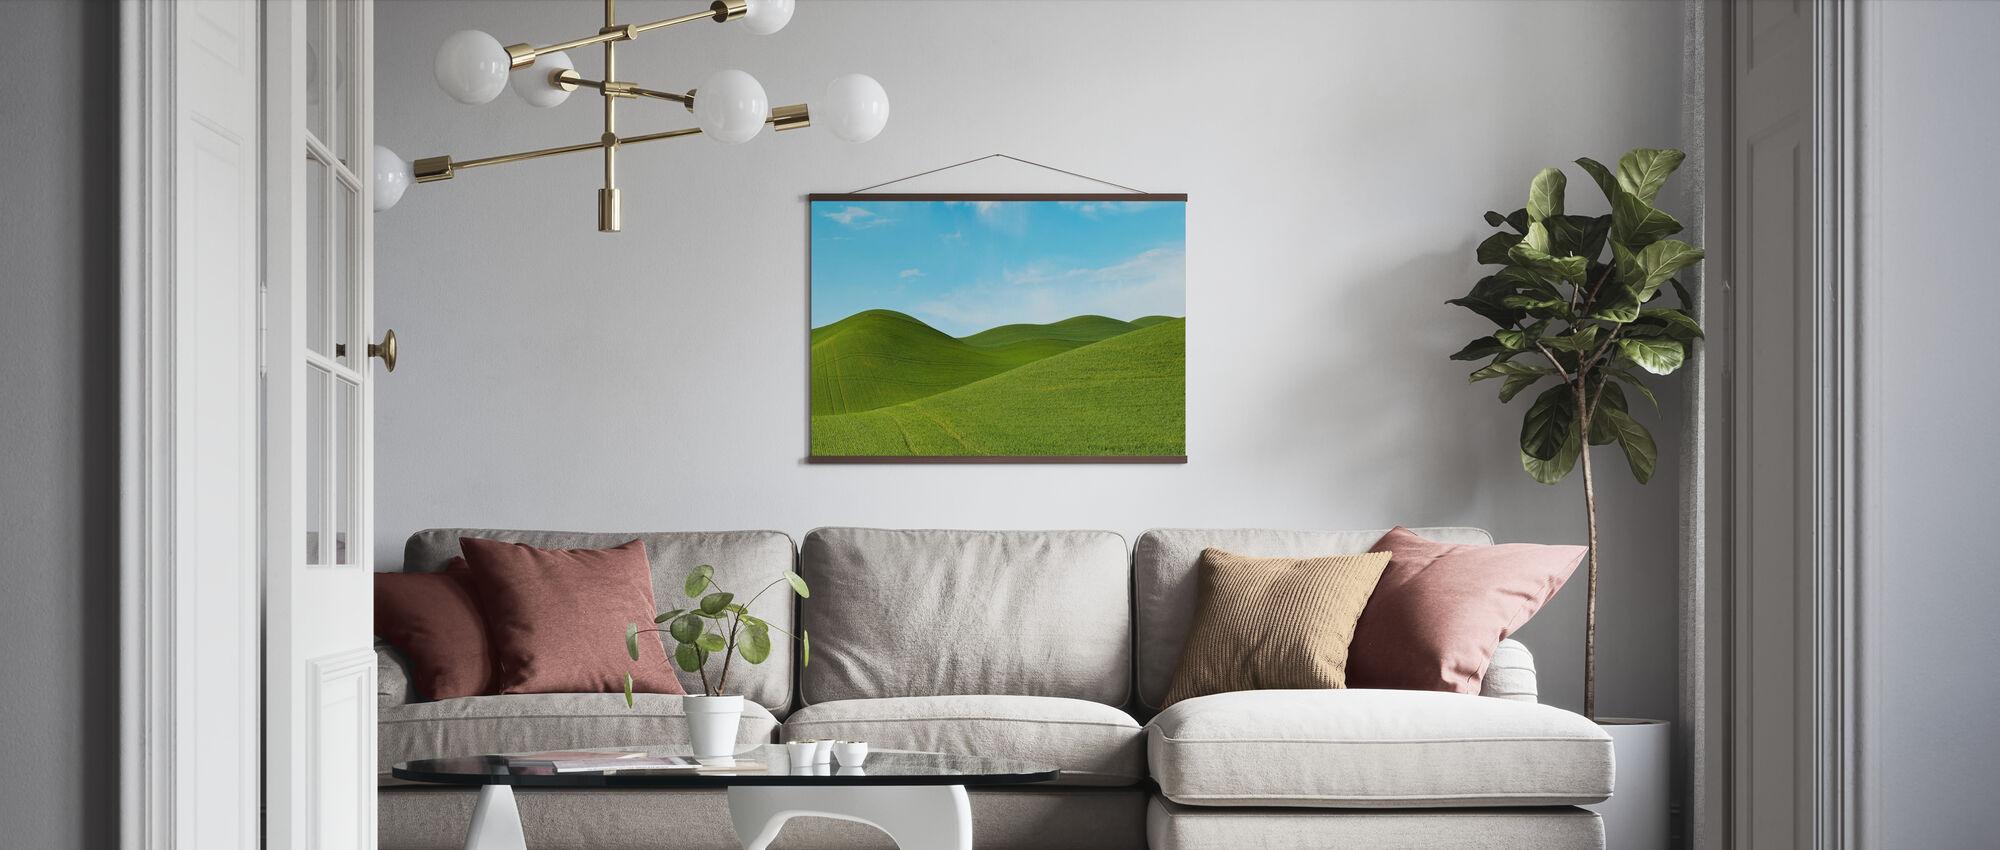 Farmscape Photo - Poster - Living Room